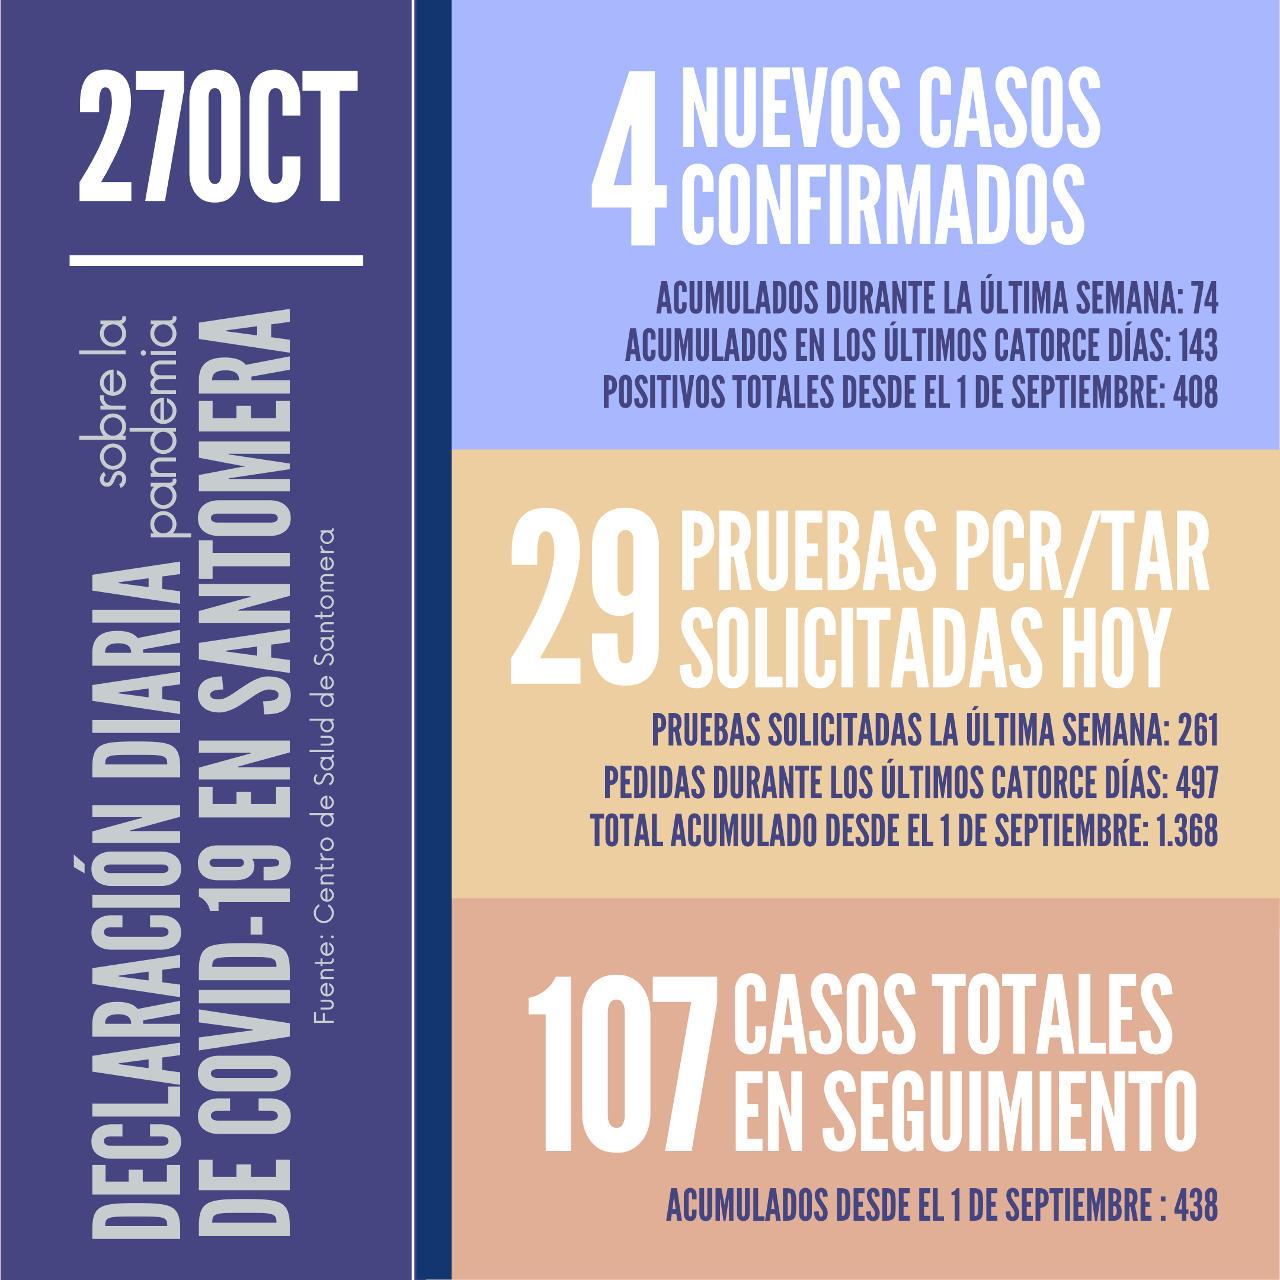 20201027_Datos COVID-19 Santomera